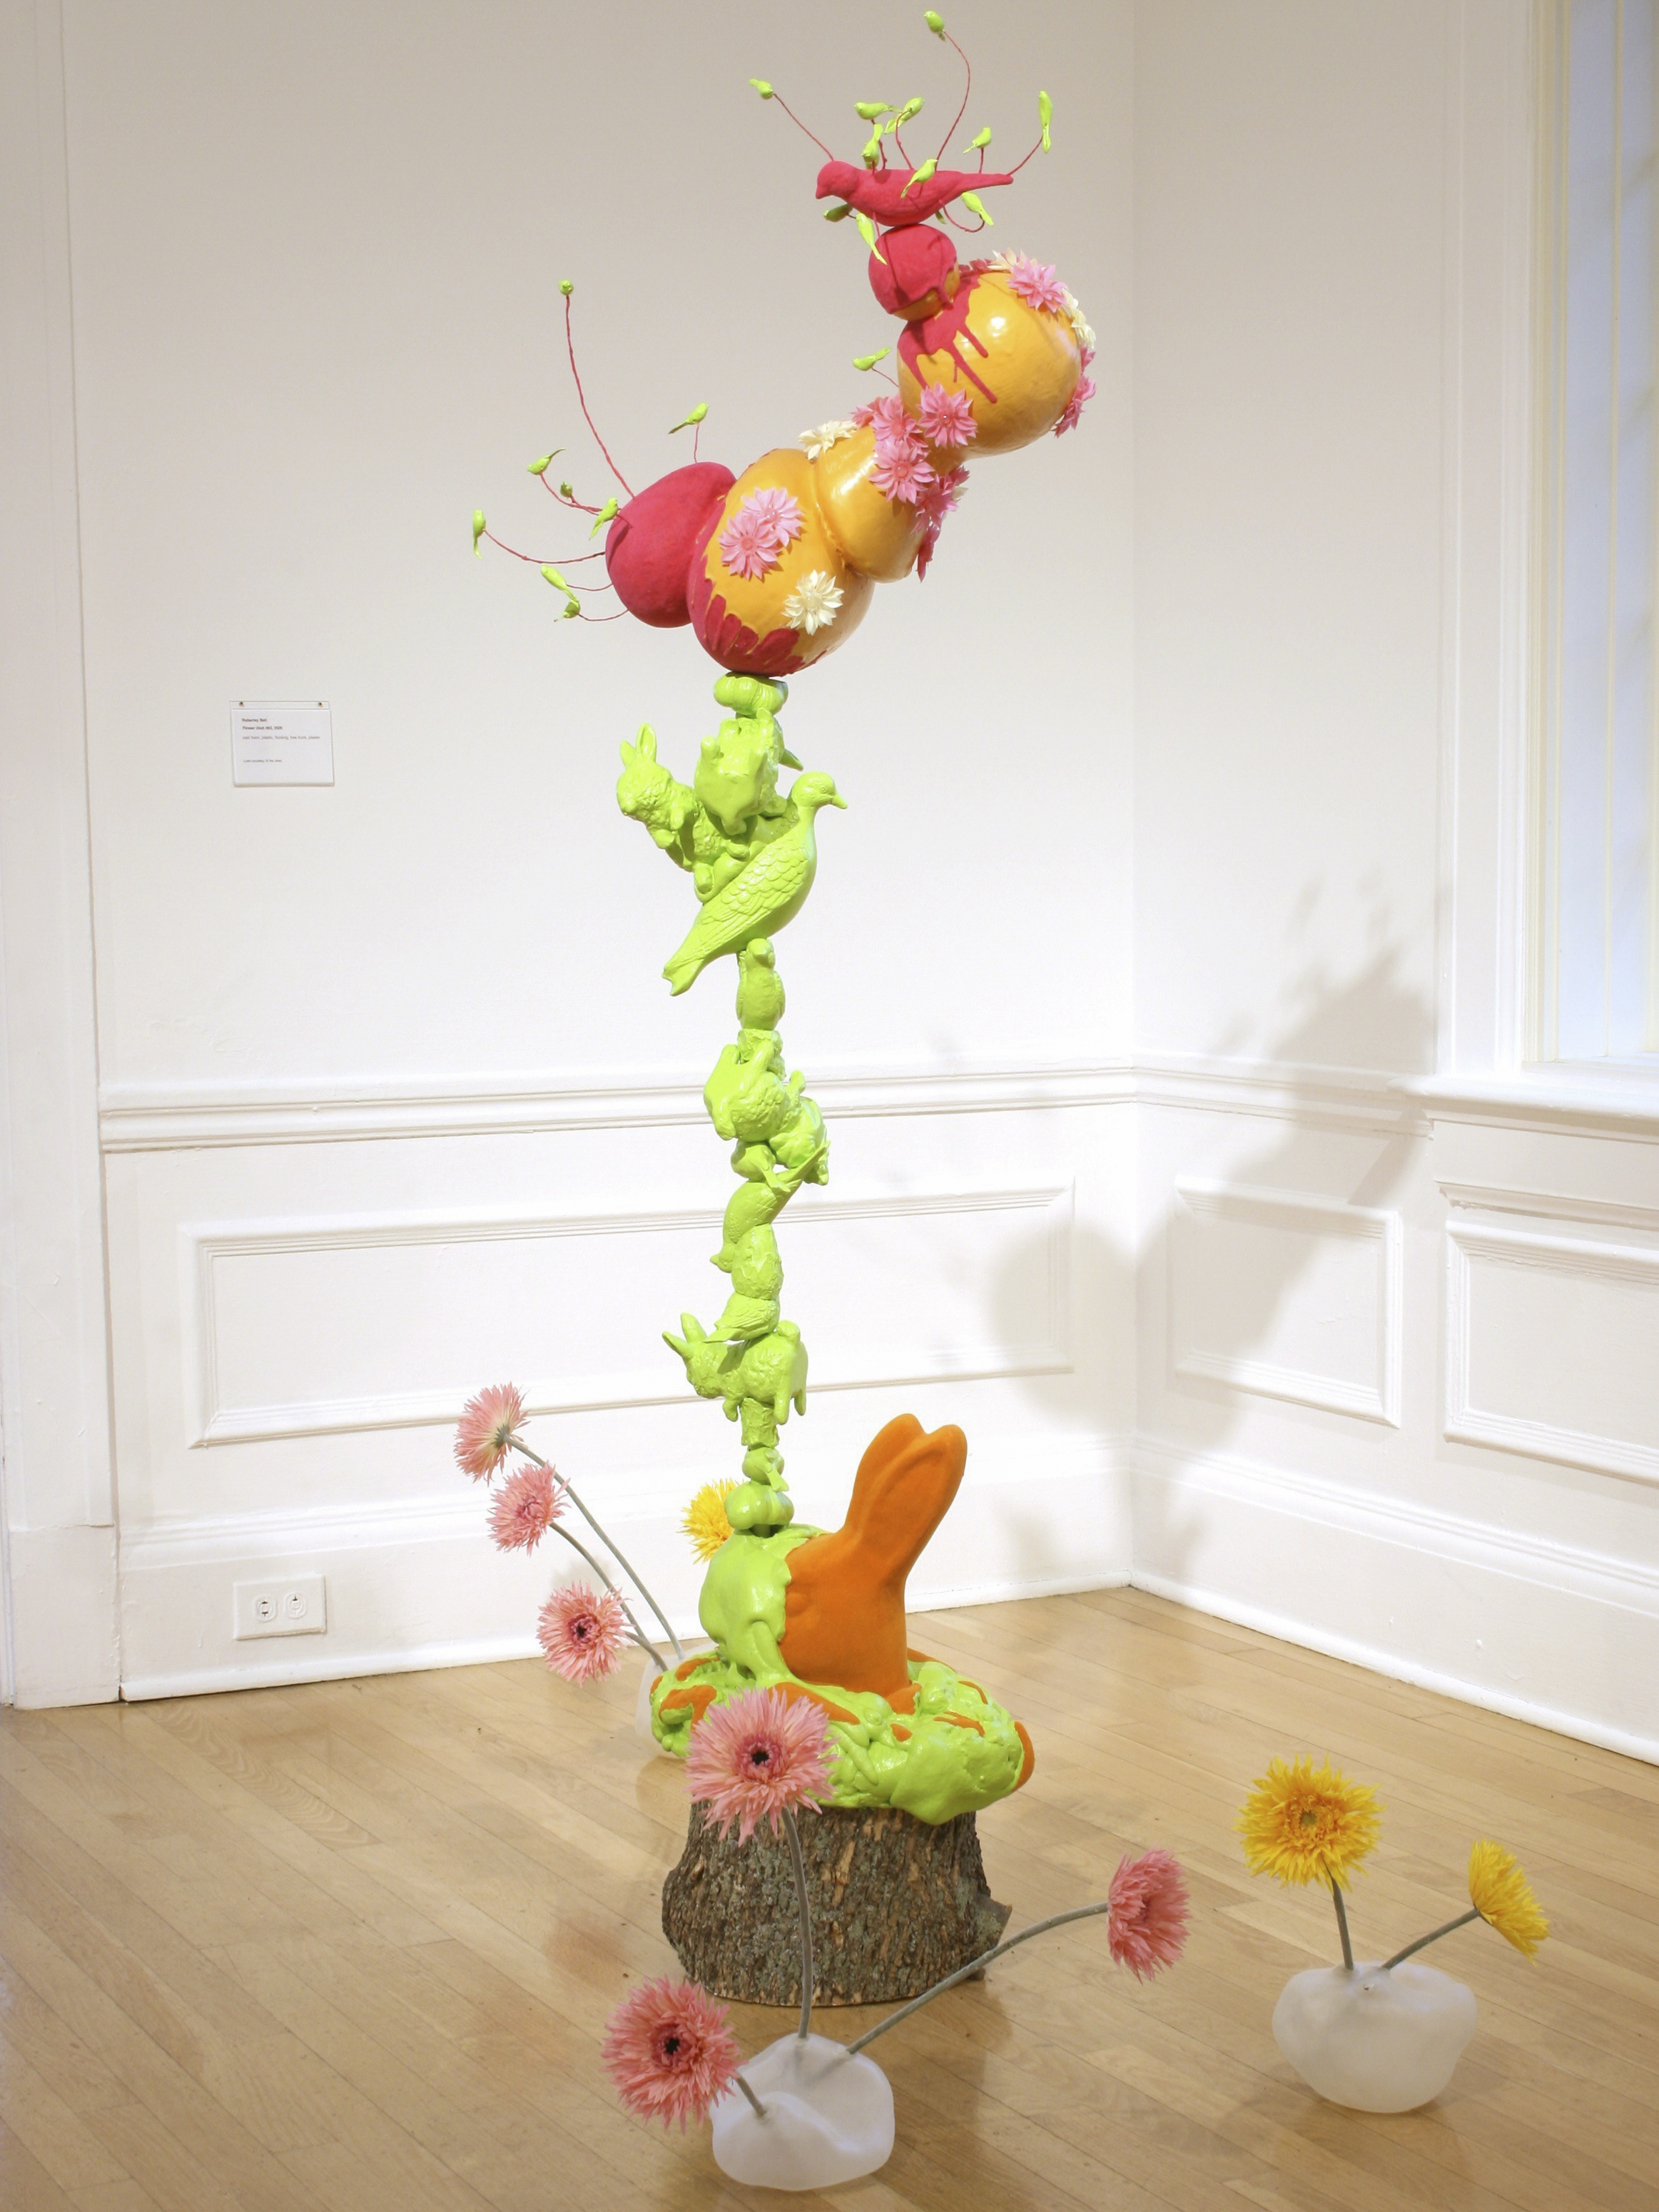 Flower Blob #83  2009  cast foam and plastic, flocking, tree trunk, plaster  65 x 22 x 12 inches